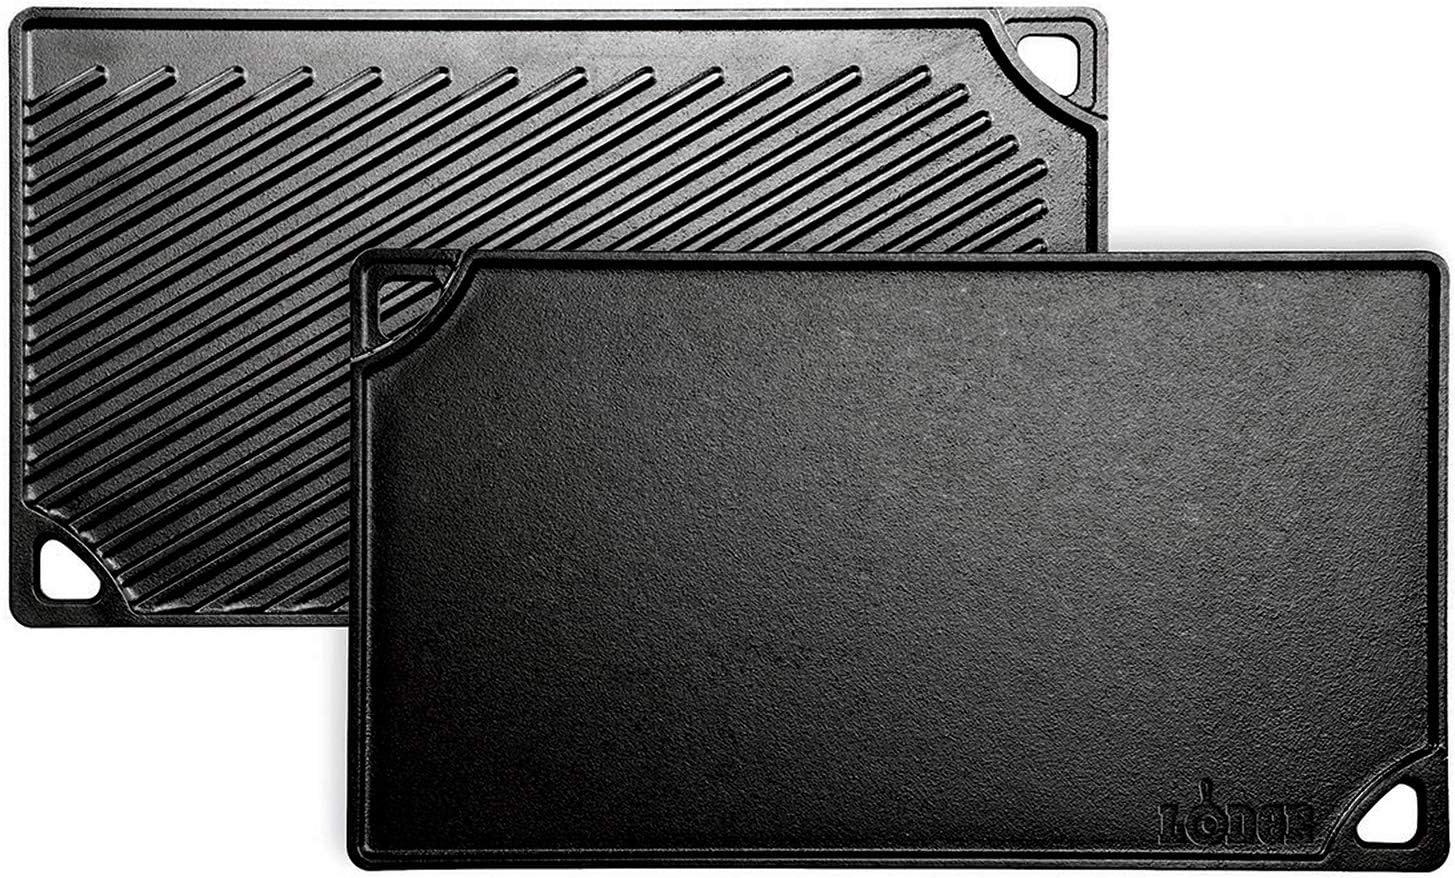 Lodge Plancha Grill rect. Reversible-Hierro Fundido 42x24cm INLODGE.LDP3, Inoxidable, 42 x 24cm